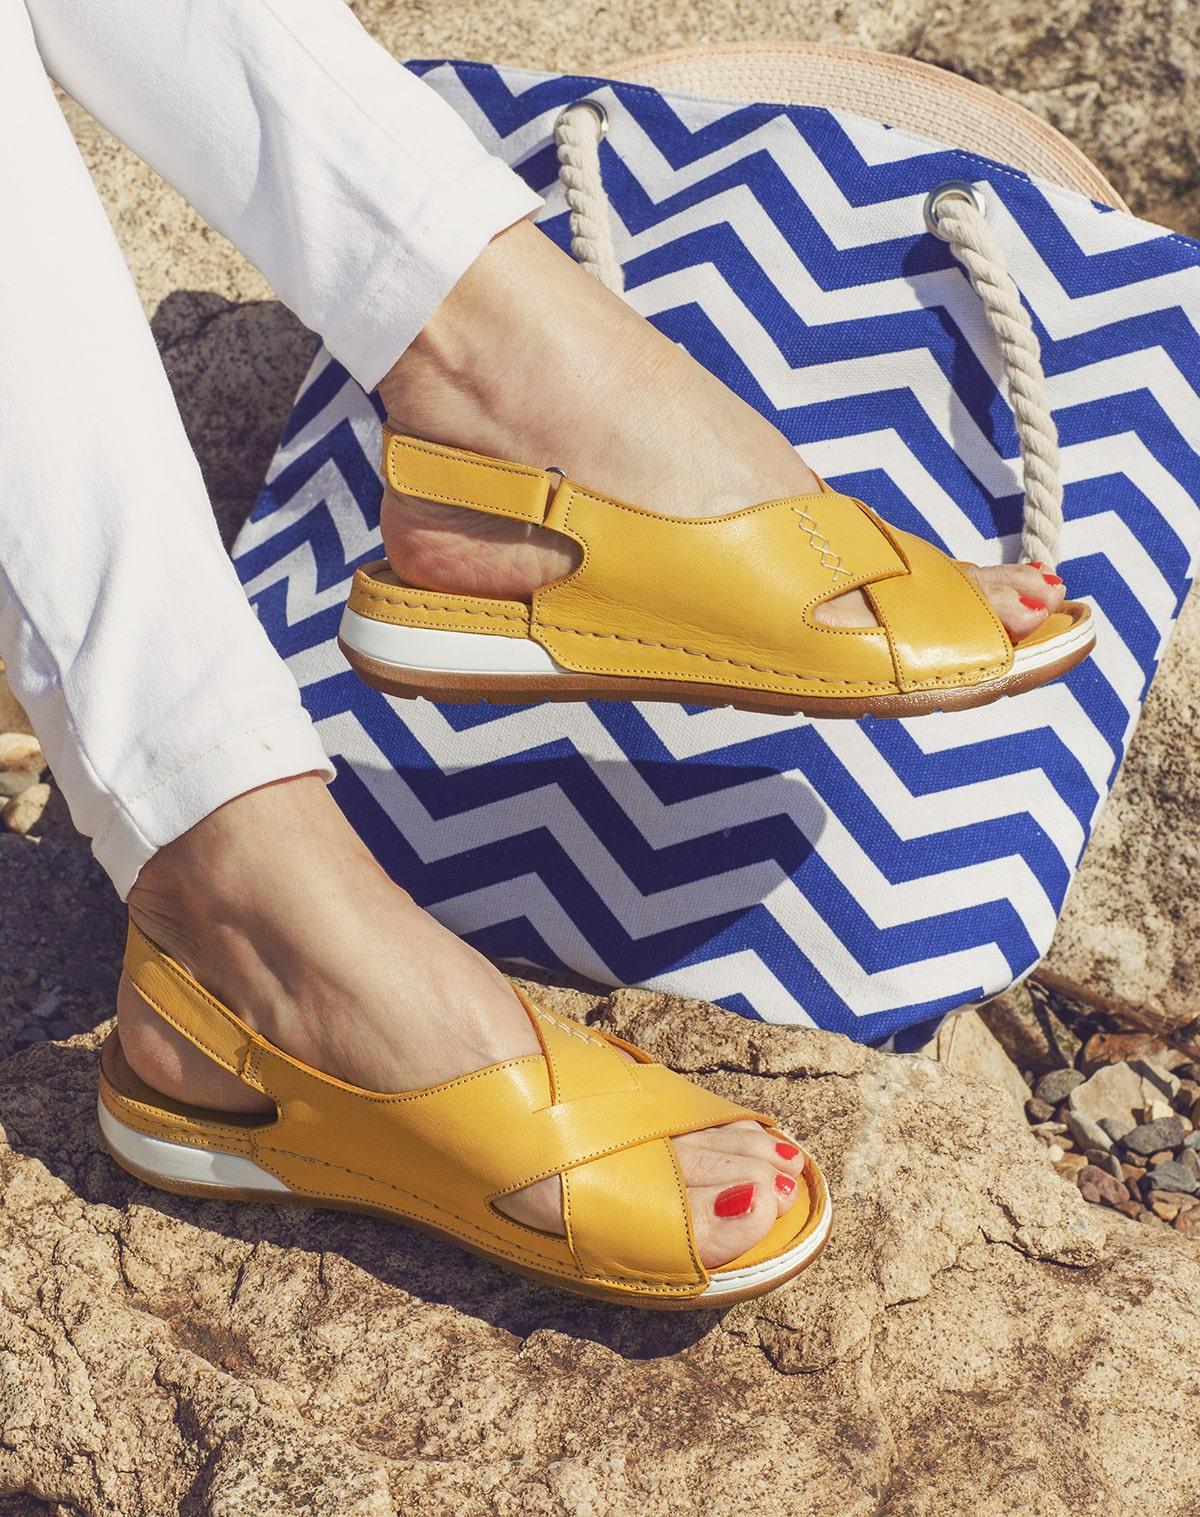 MKOC33001 Sandals